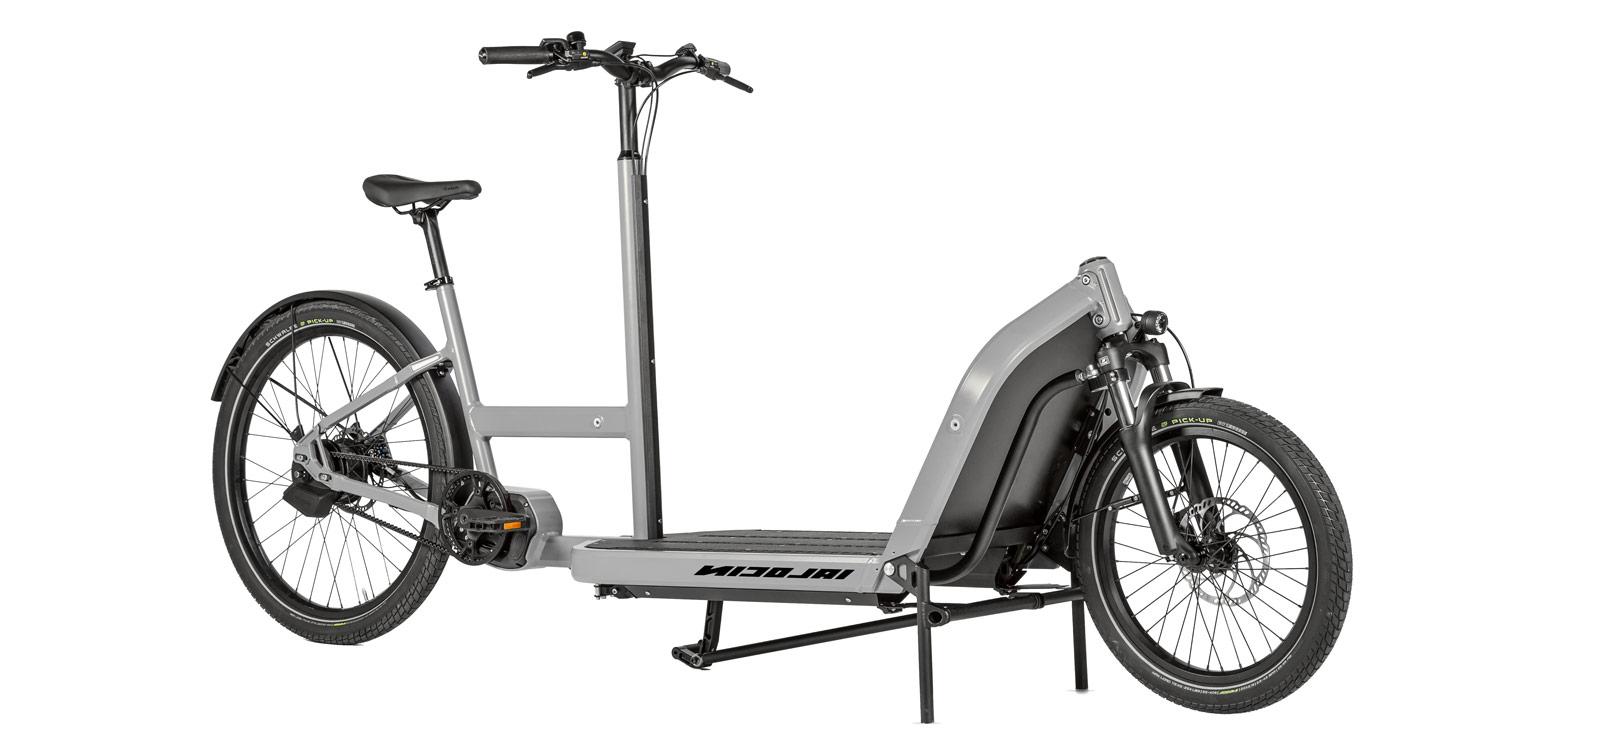 nicolai nc-1 ecargo bike